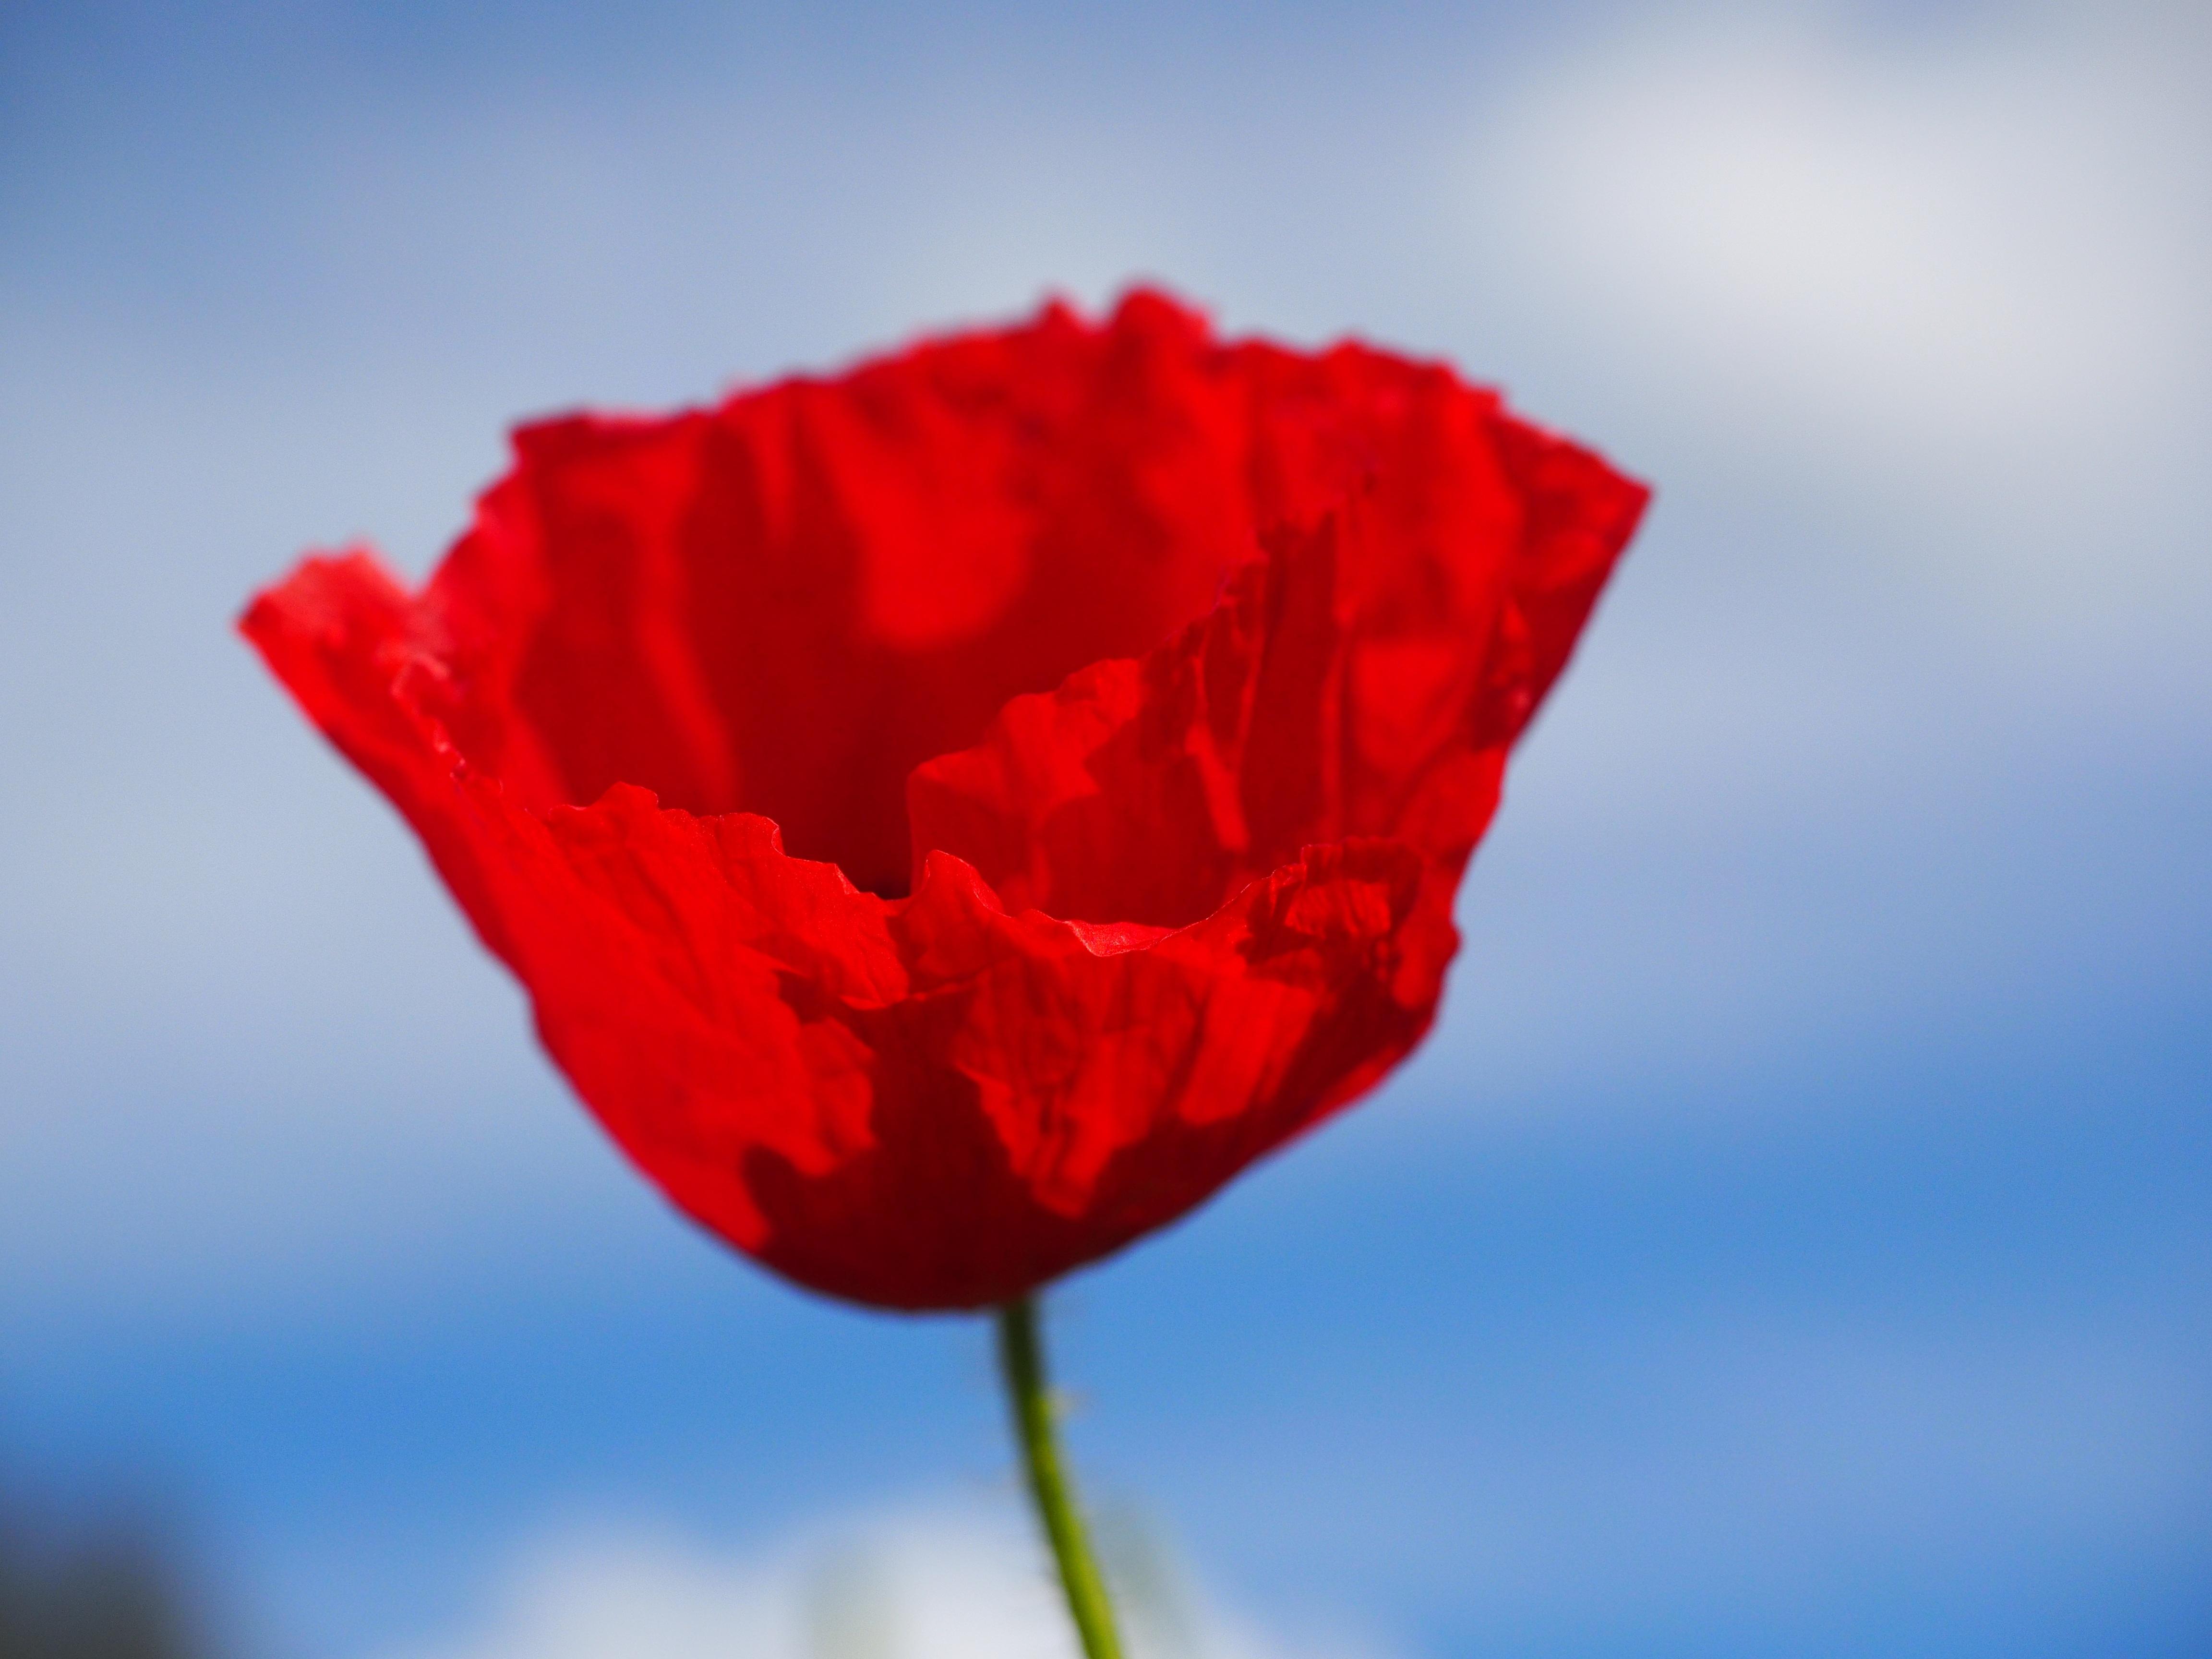 Free Images : blossom, sky, petal, bloom, color, colorful, close ...